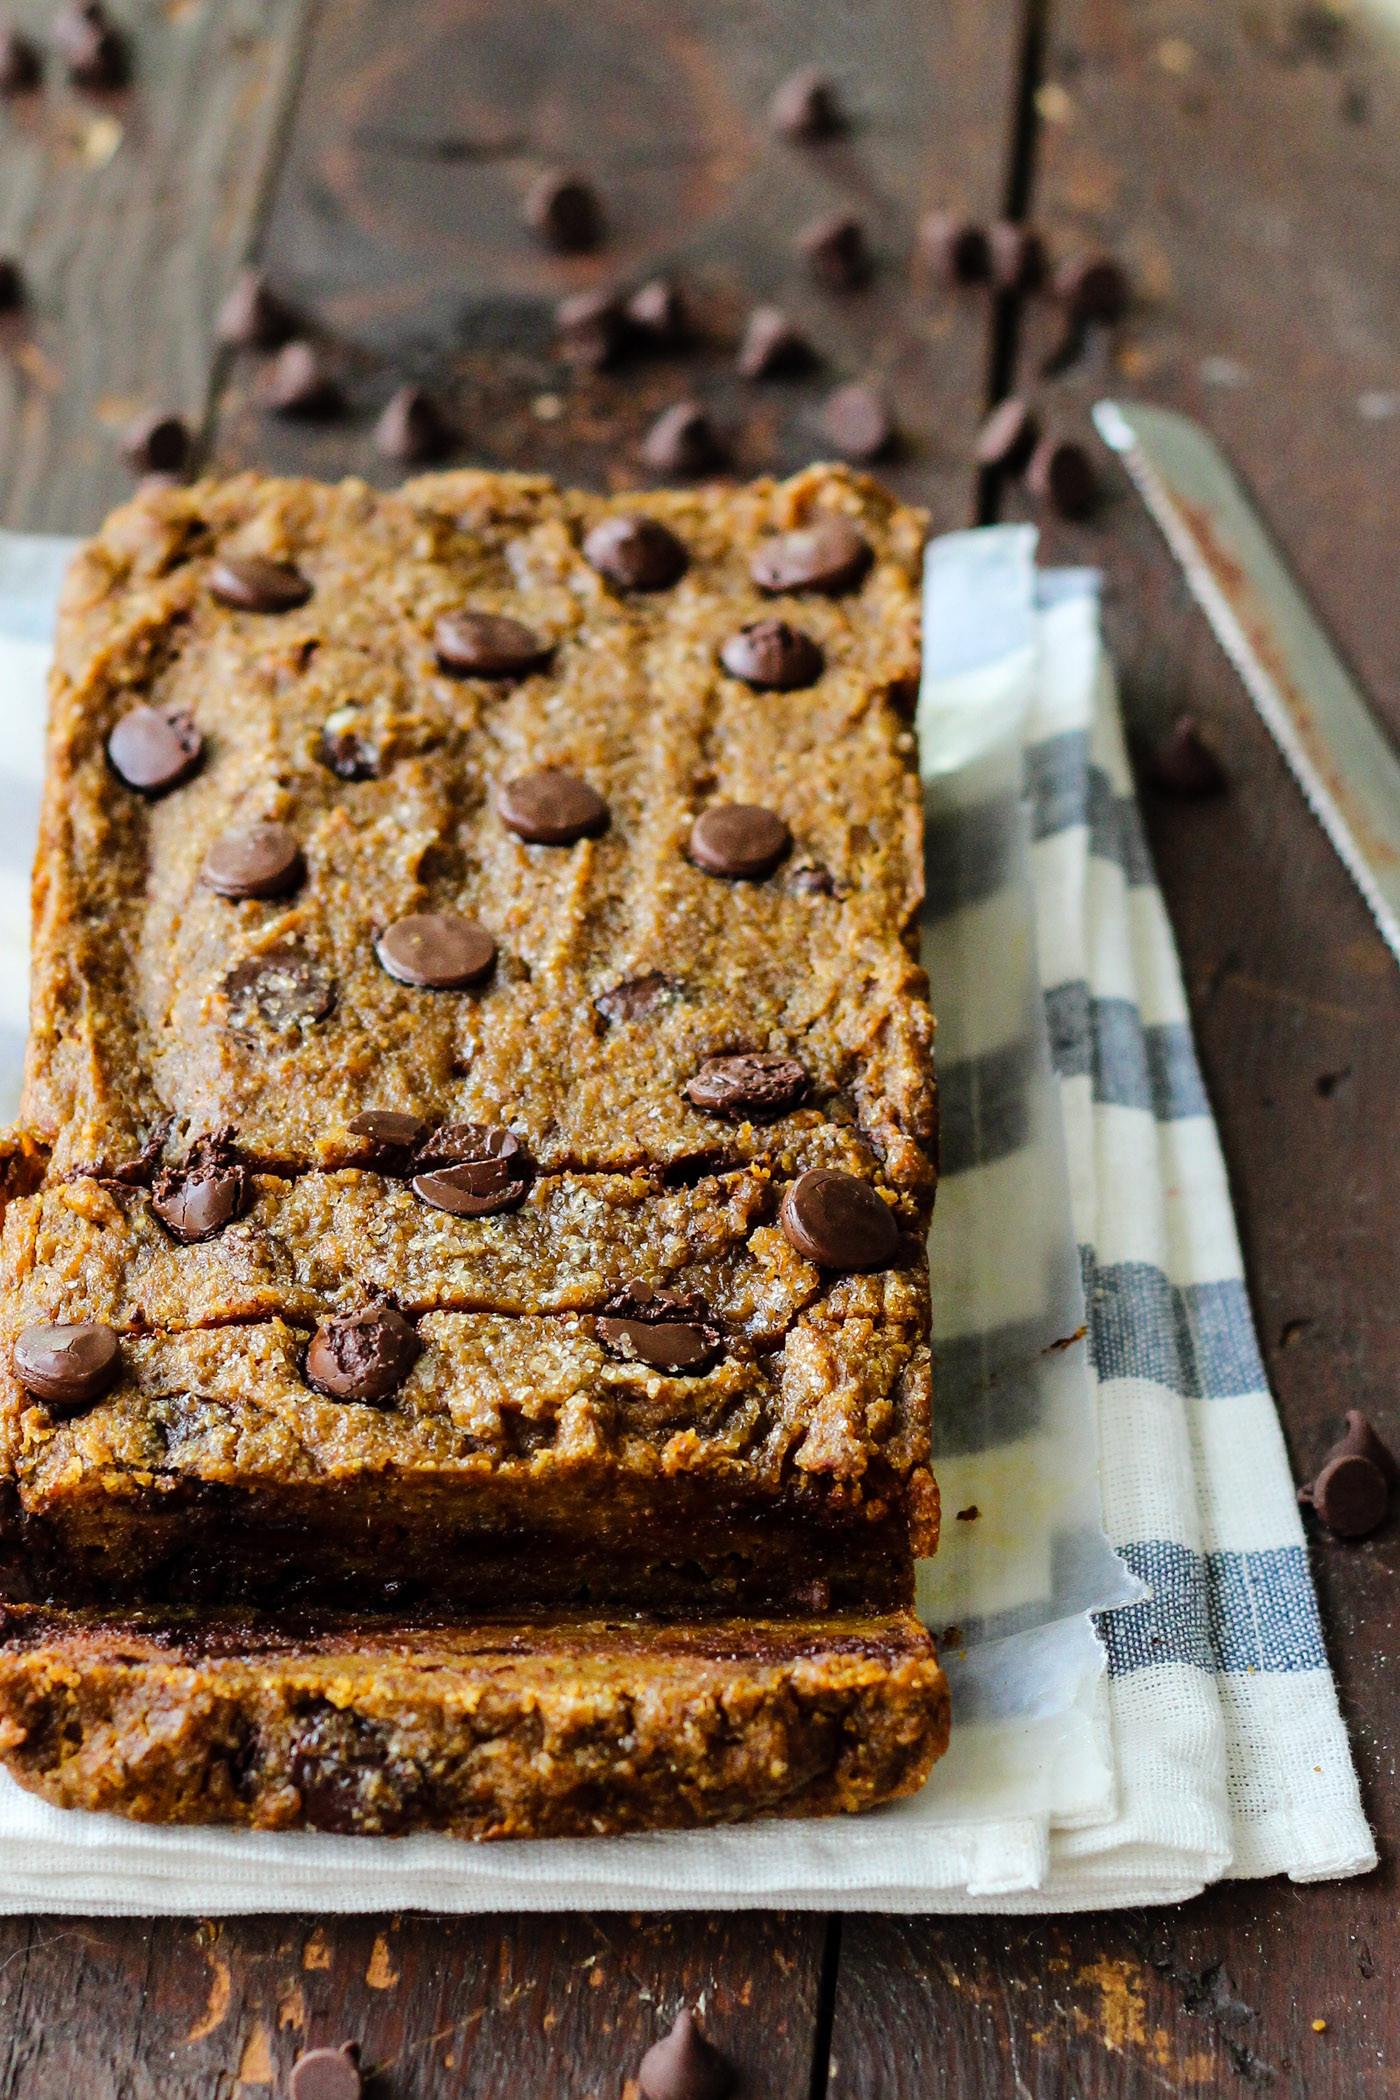 Healthy Chocolate Pumpkin Bread 20 Best Ideas Healthy Chocolate Chip Pumpkin Bread – the Yooper Girl